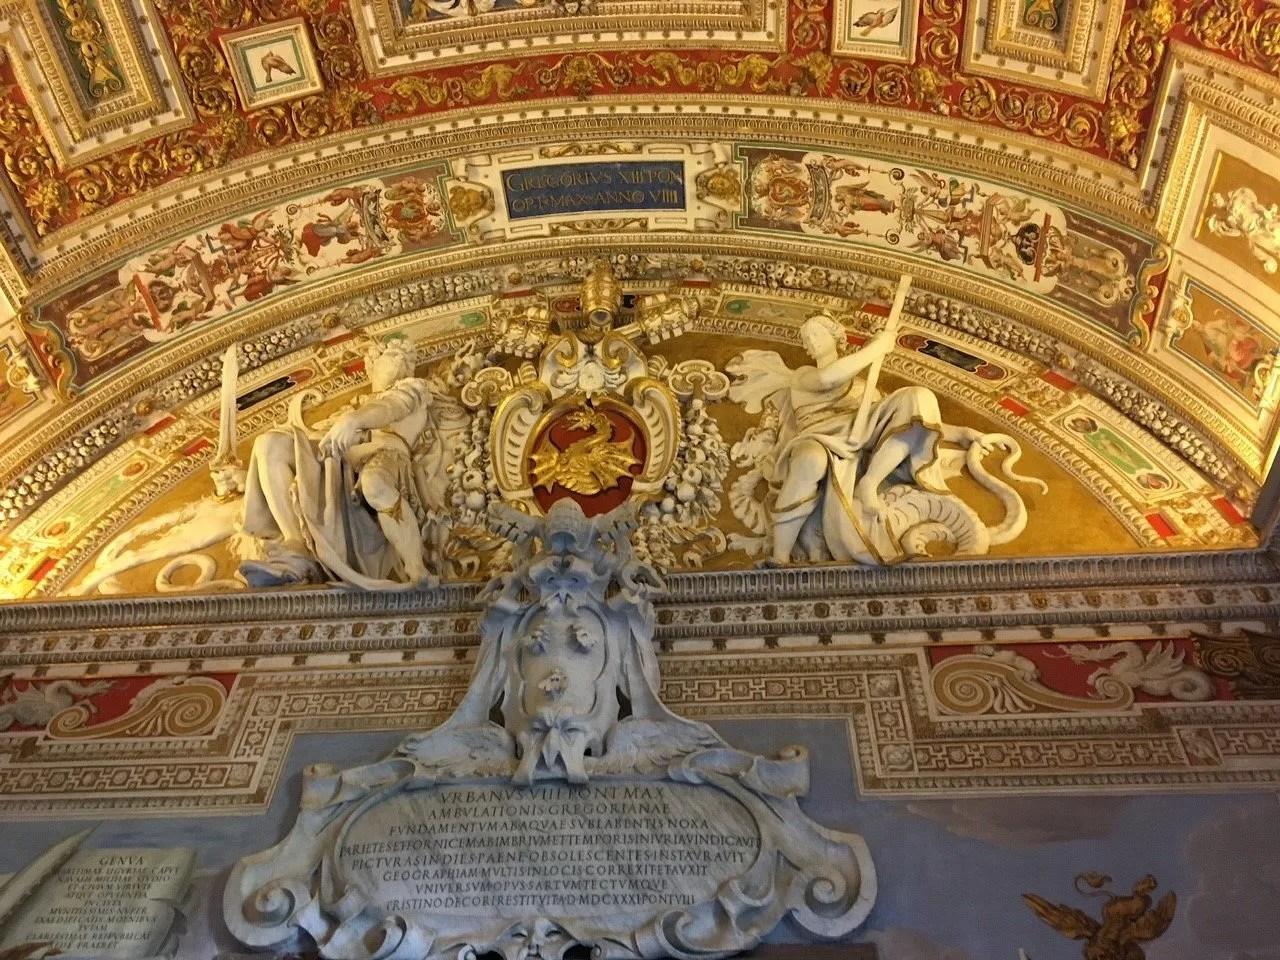 A wall inside the Sistine Chapel, Vatican City